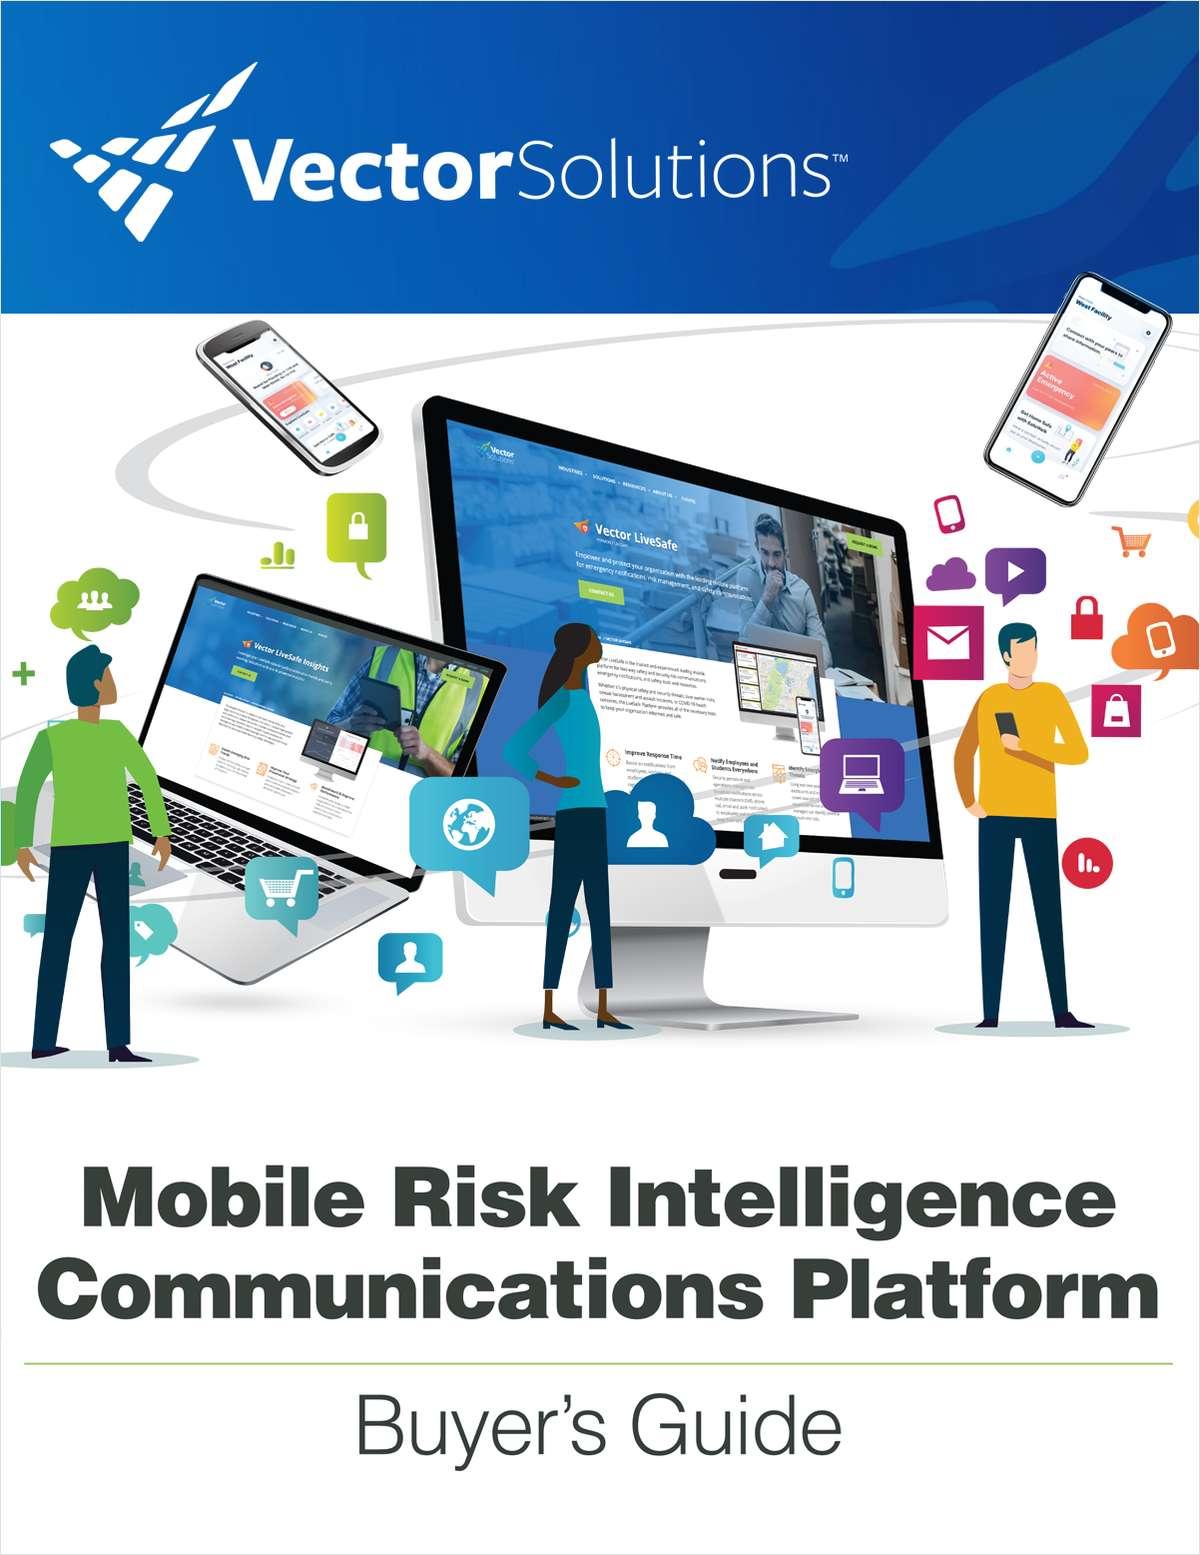 Mobile Risk Intelligence Communications Platform Buyer's Guide